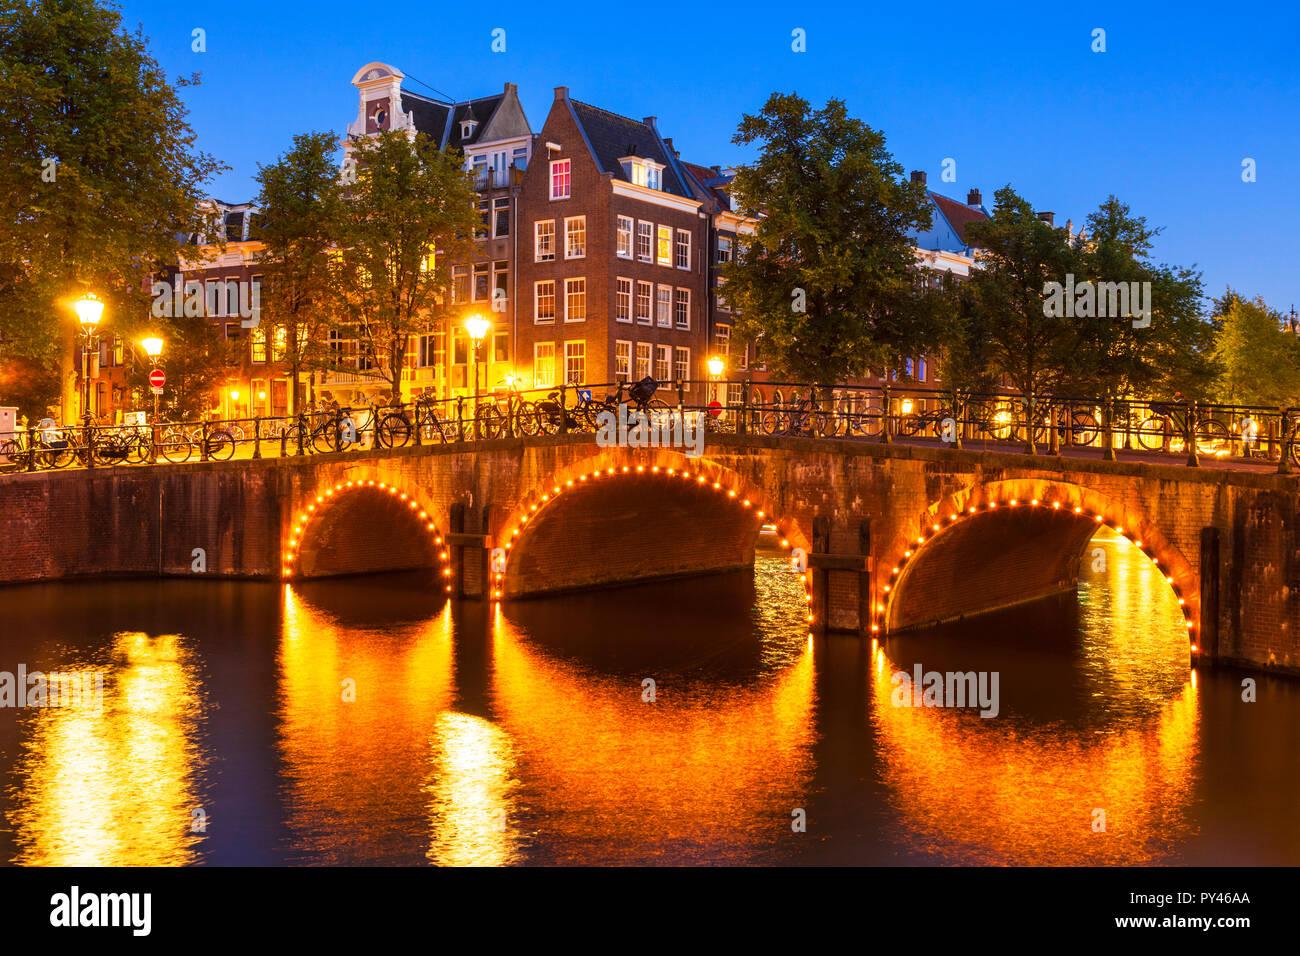 Amsterdam canal Keizergracht iluminado Puente sobre el canal y puente Leliegracht Amsterdam Holanda Holanda UE Europa Imagen De Stock